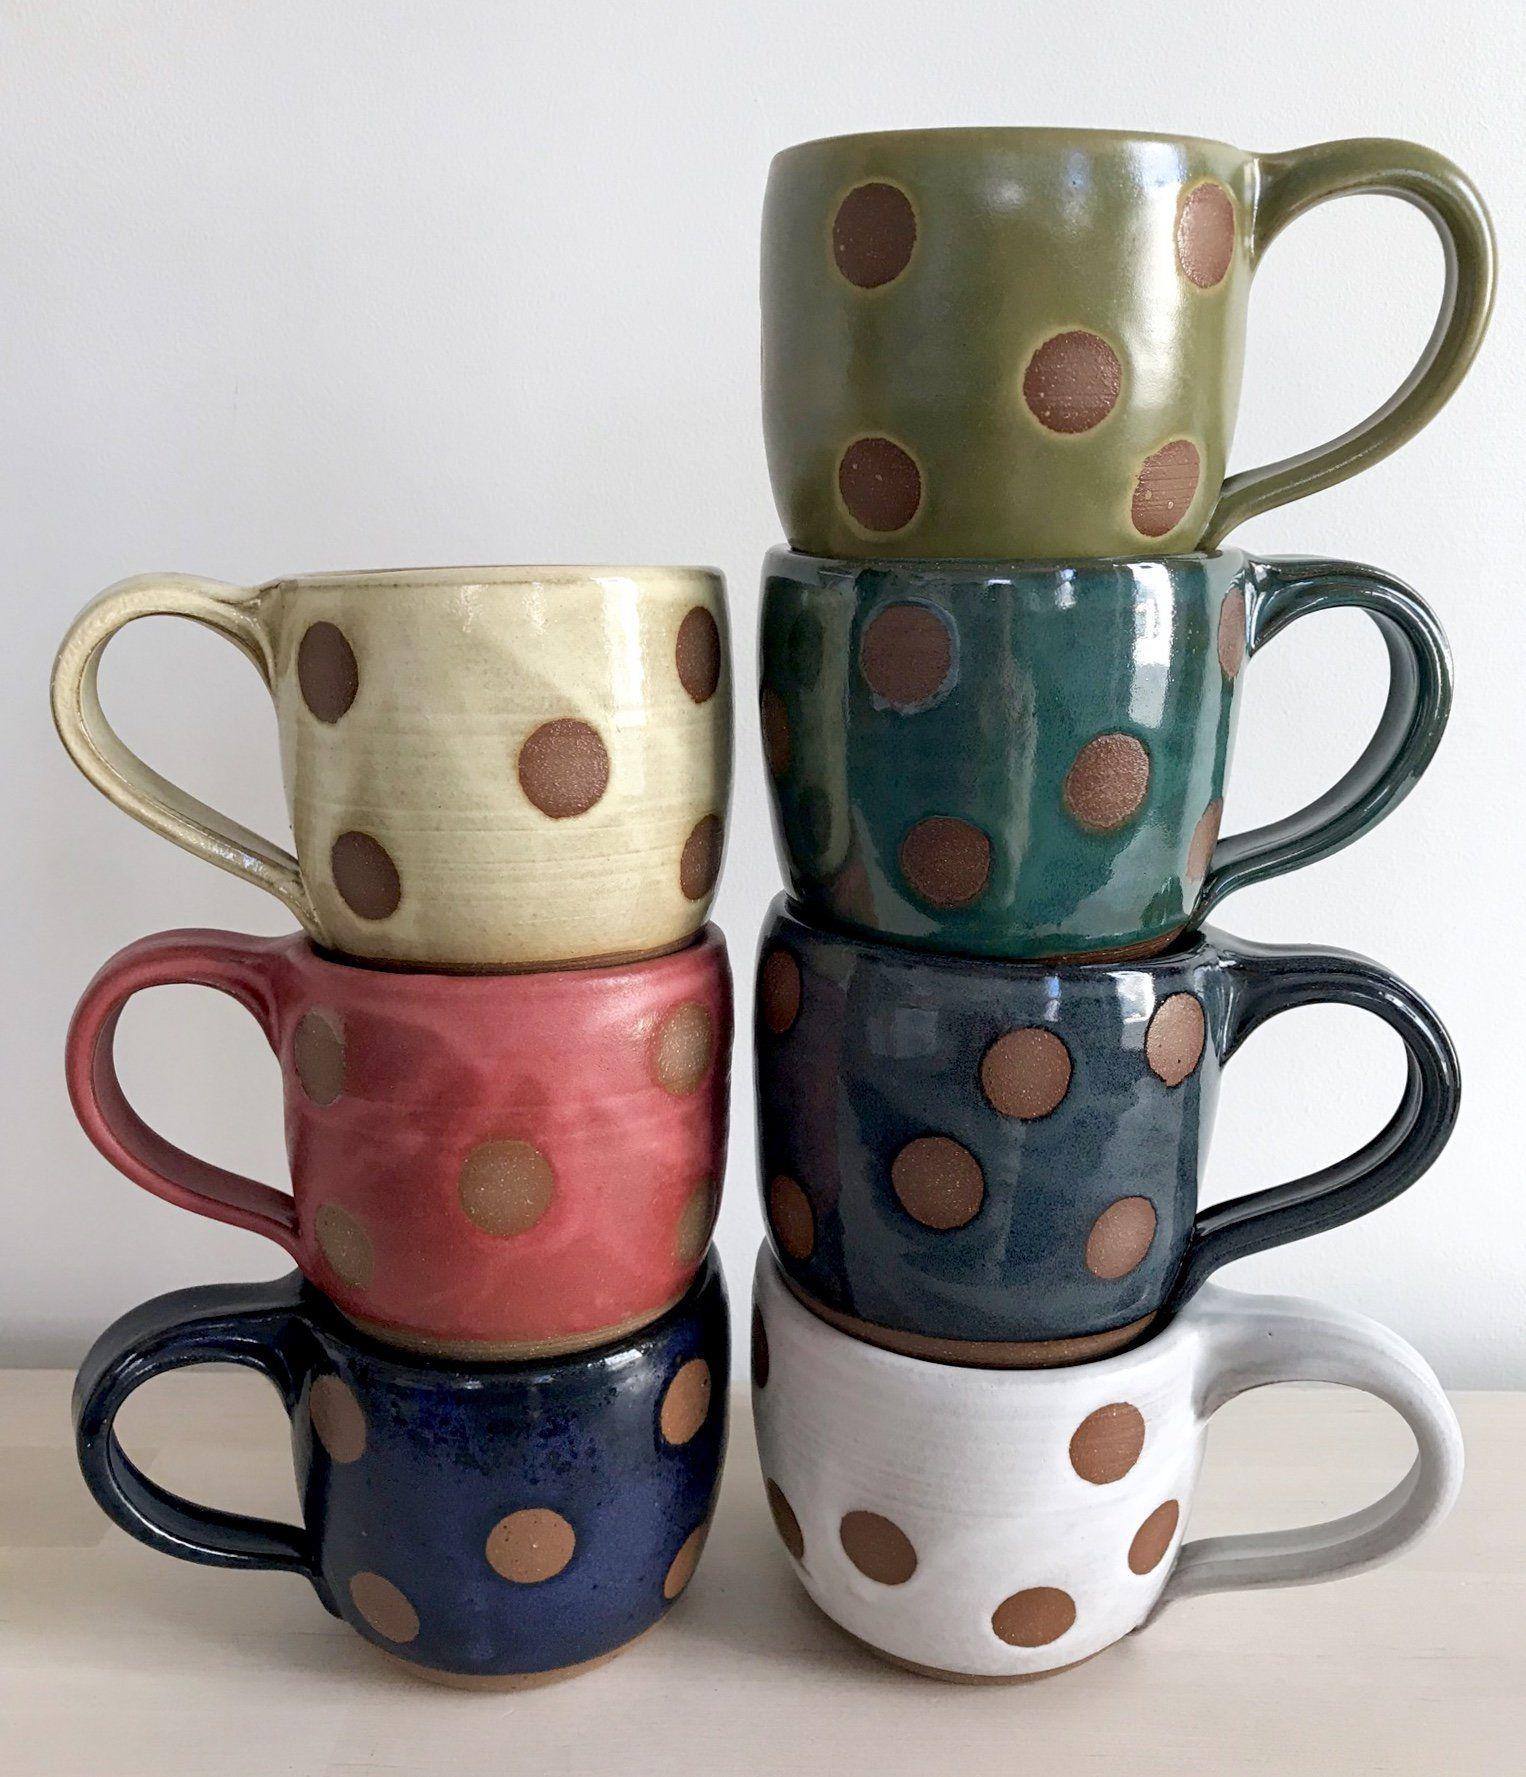 Stripe & Dot Mugs by Louise Bilodeau (Ceramic Mug)   Artful Home